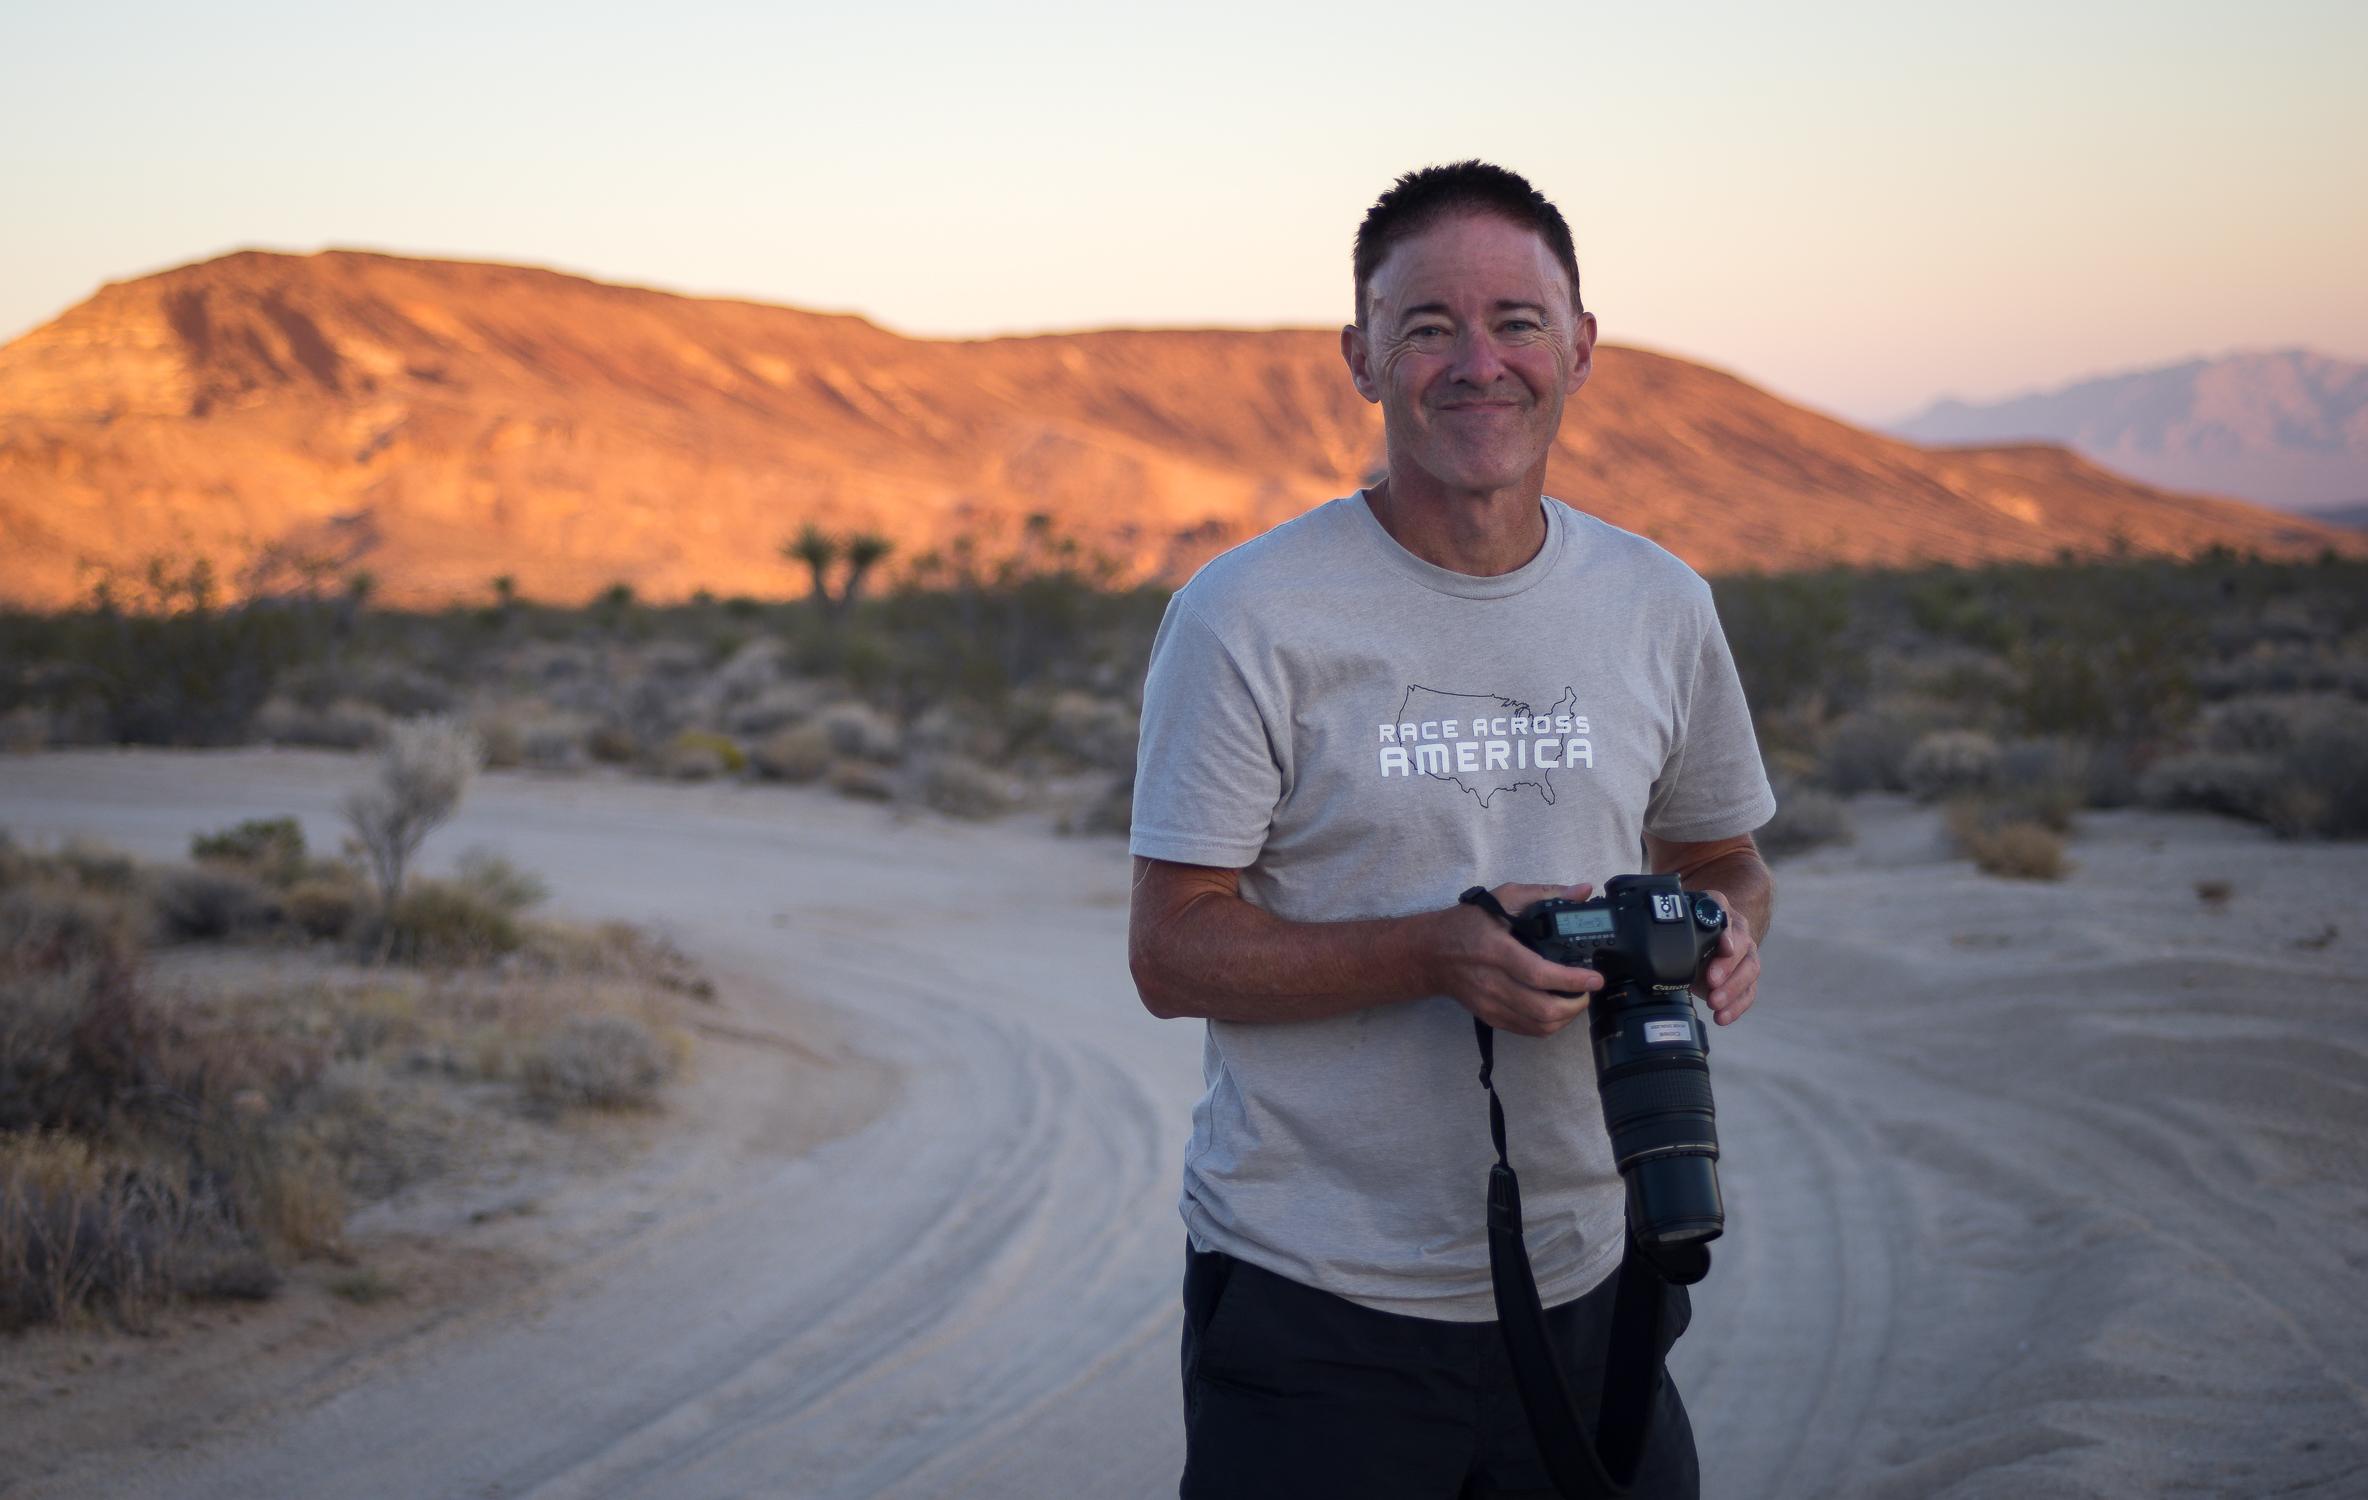 Mojave Preserve in California. Photo by Eric Peffer